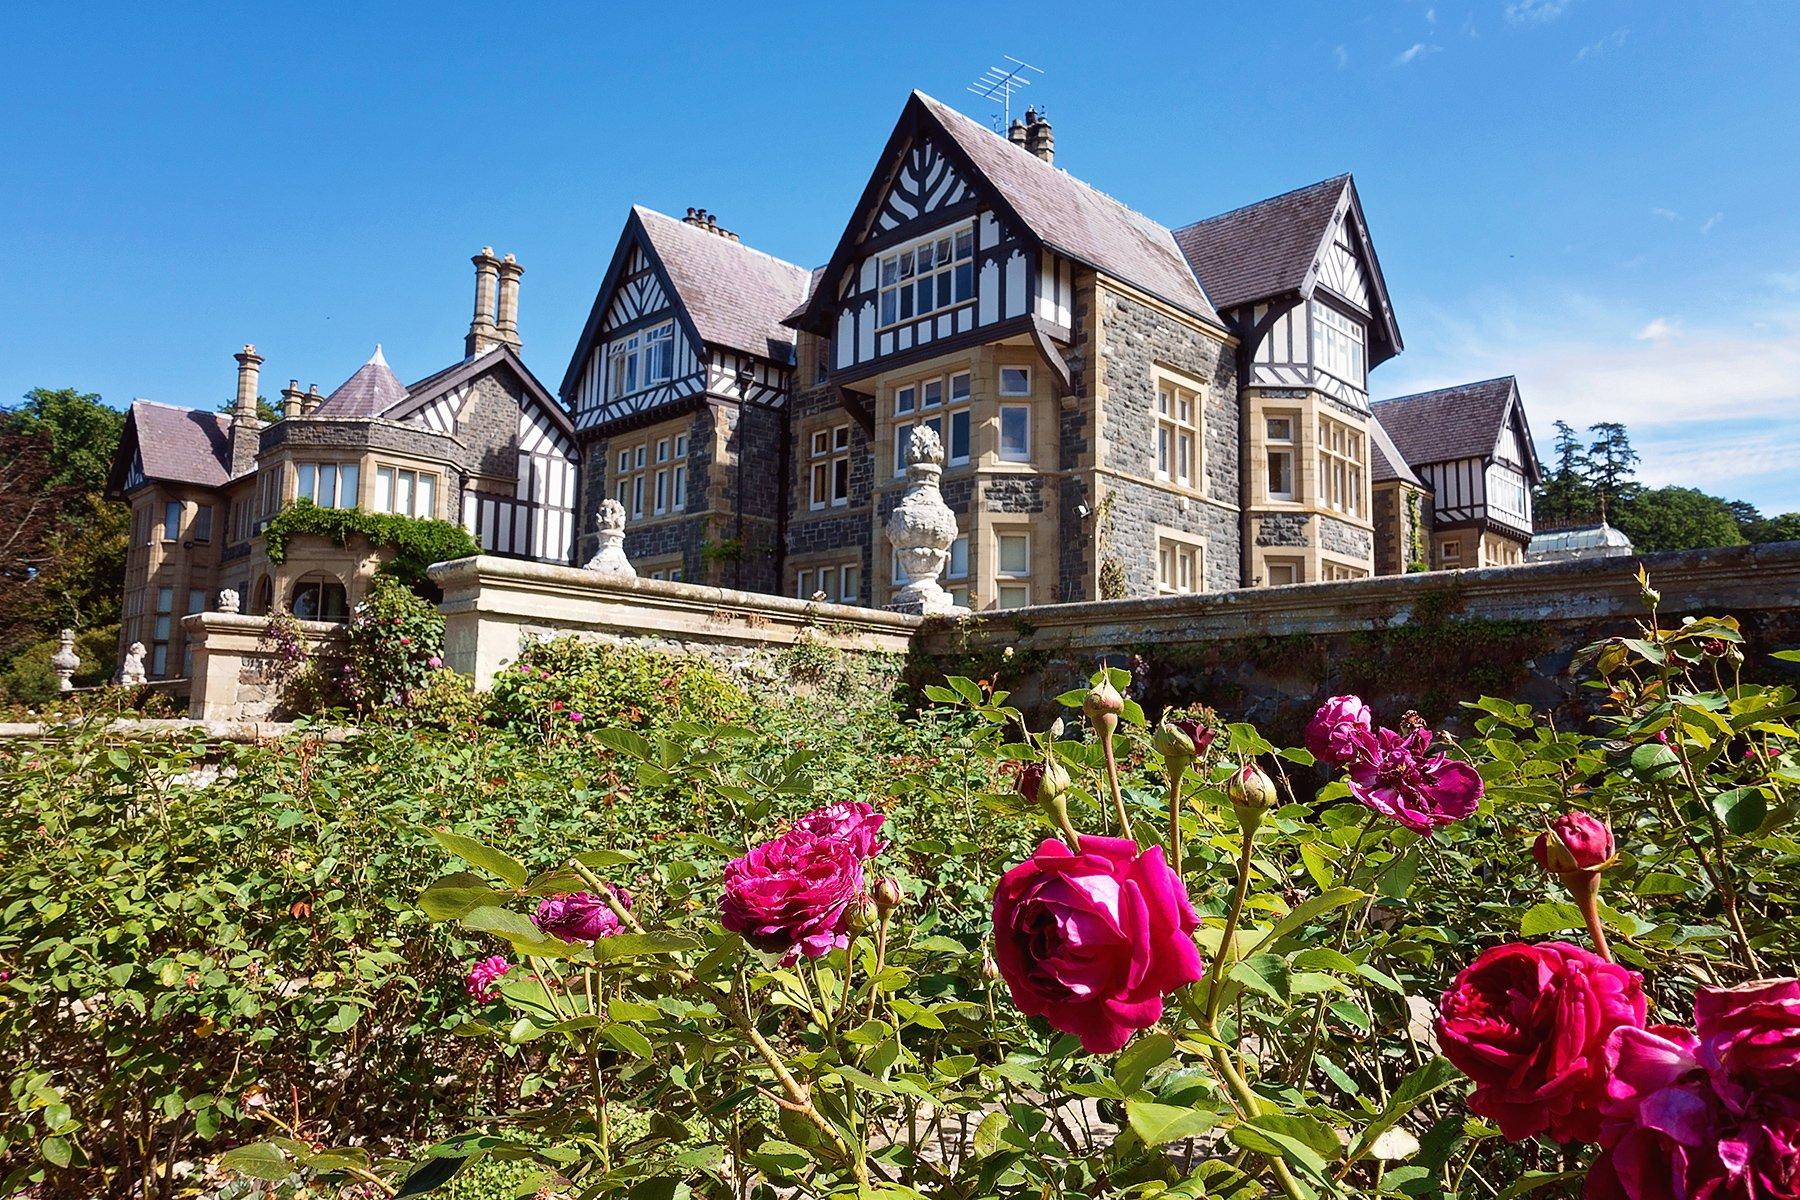 Bodnant garden in Wales